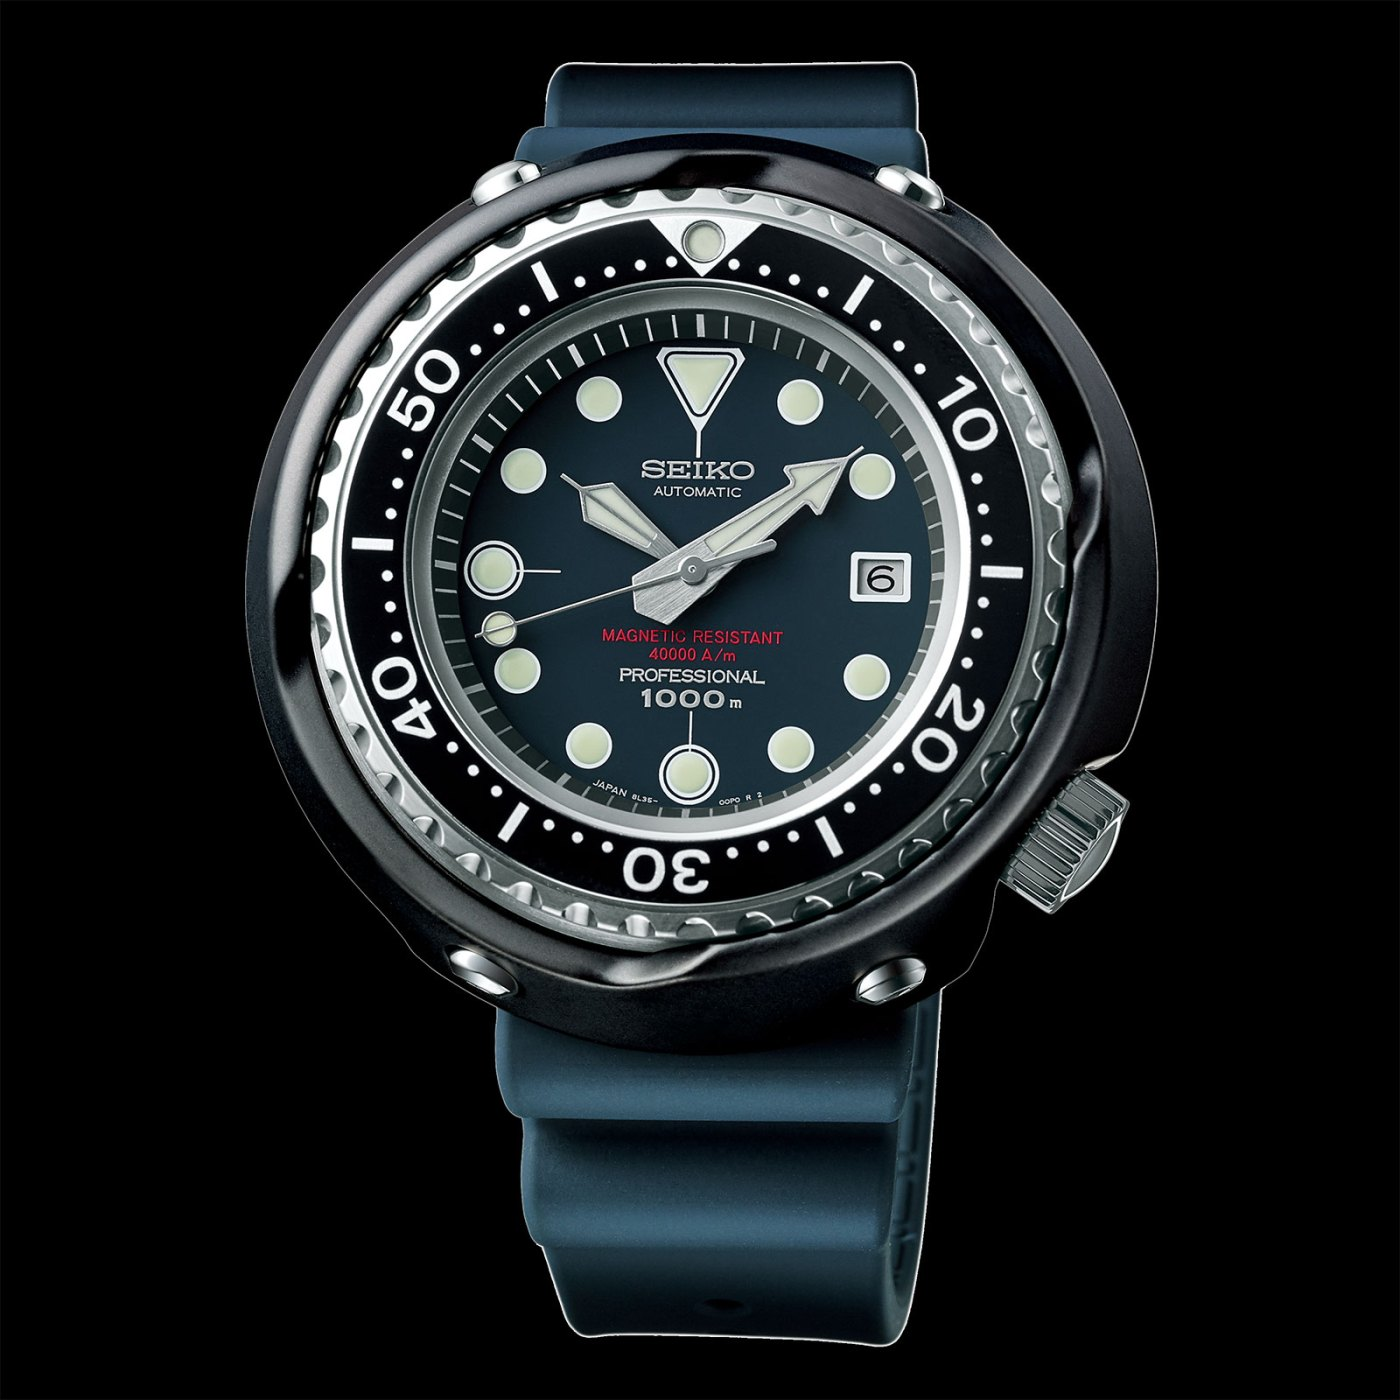 2020 Seiko 1975 Professional Divers remake Ref. SLA041